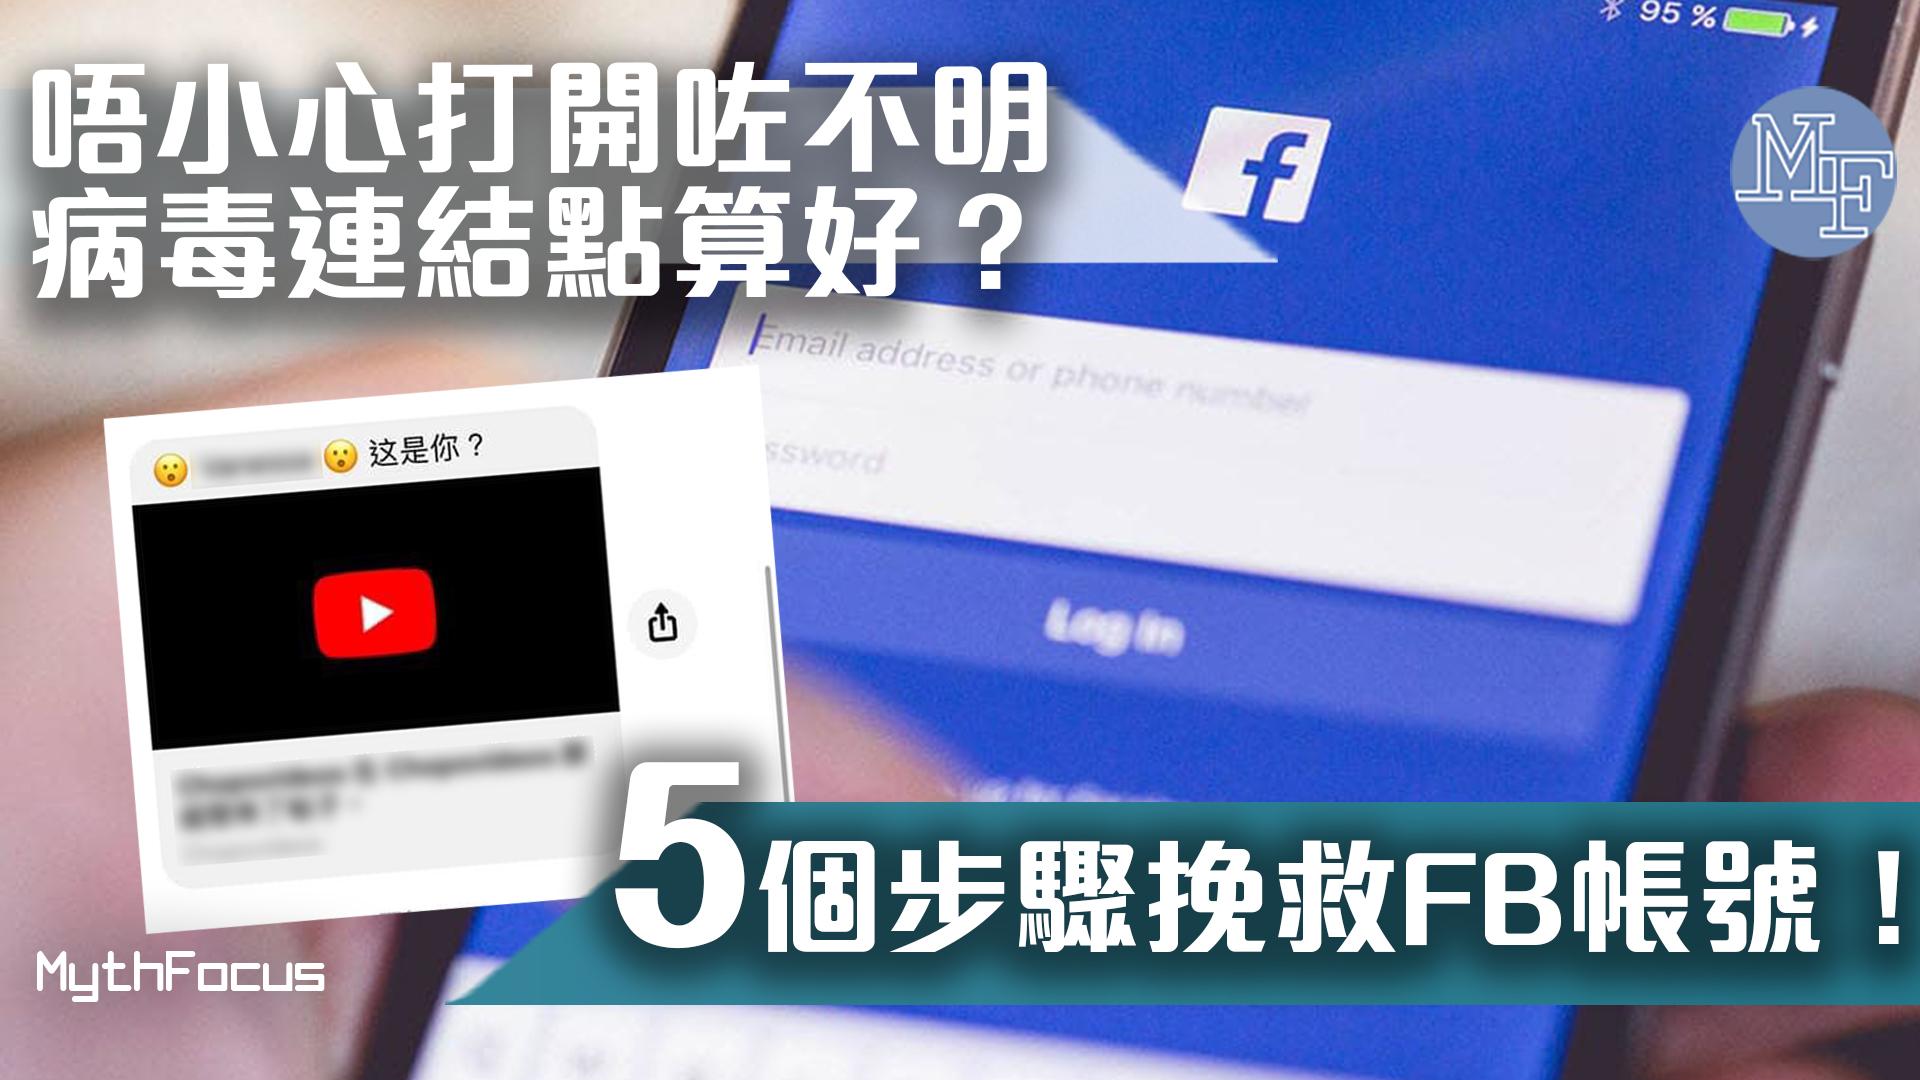 【Messenger中毒】唔小心打開咗「這是你?」不明病毒連結點算好?5個步驟挽救Facebook帳號!